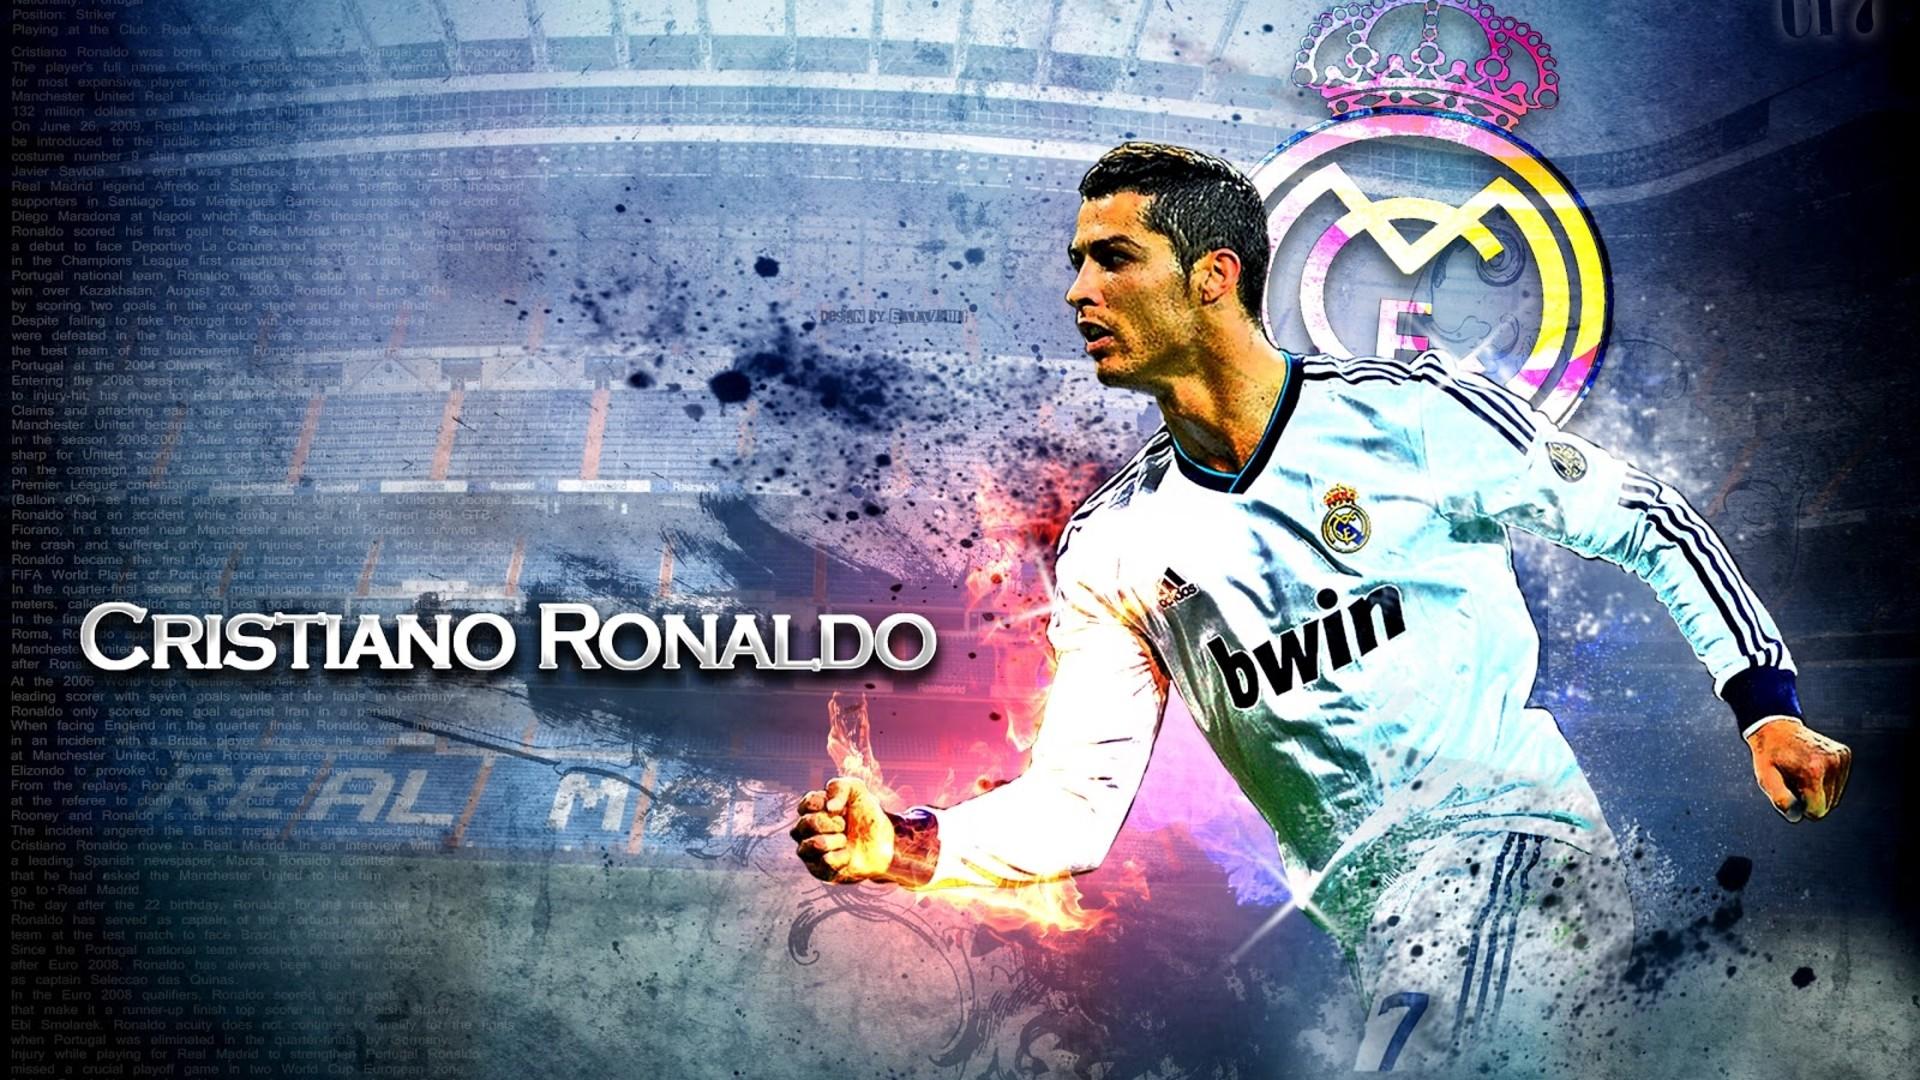 Football Cristiano Ronaldo Hd Wallpapers: Cristiano Ronaldo HD Wallpaper